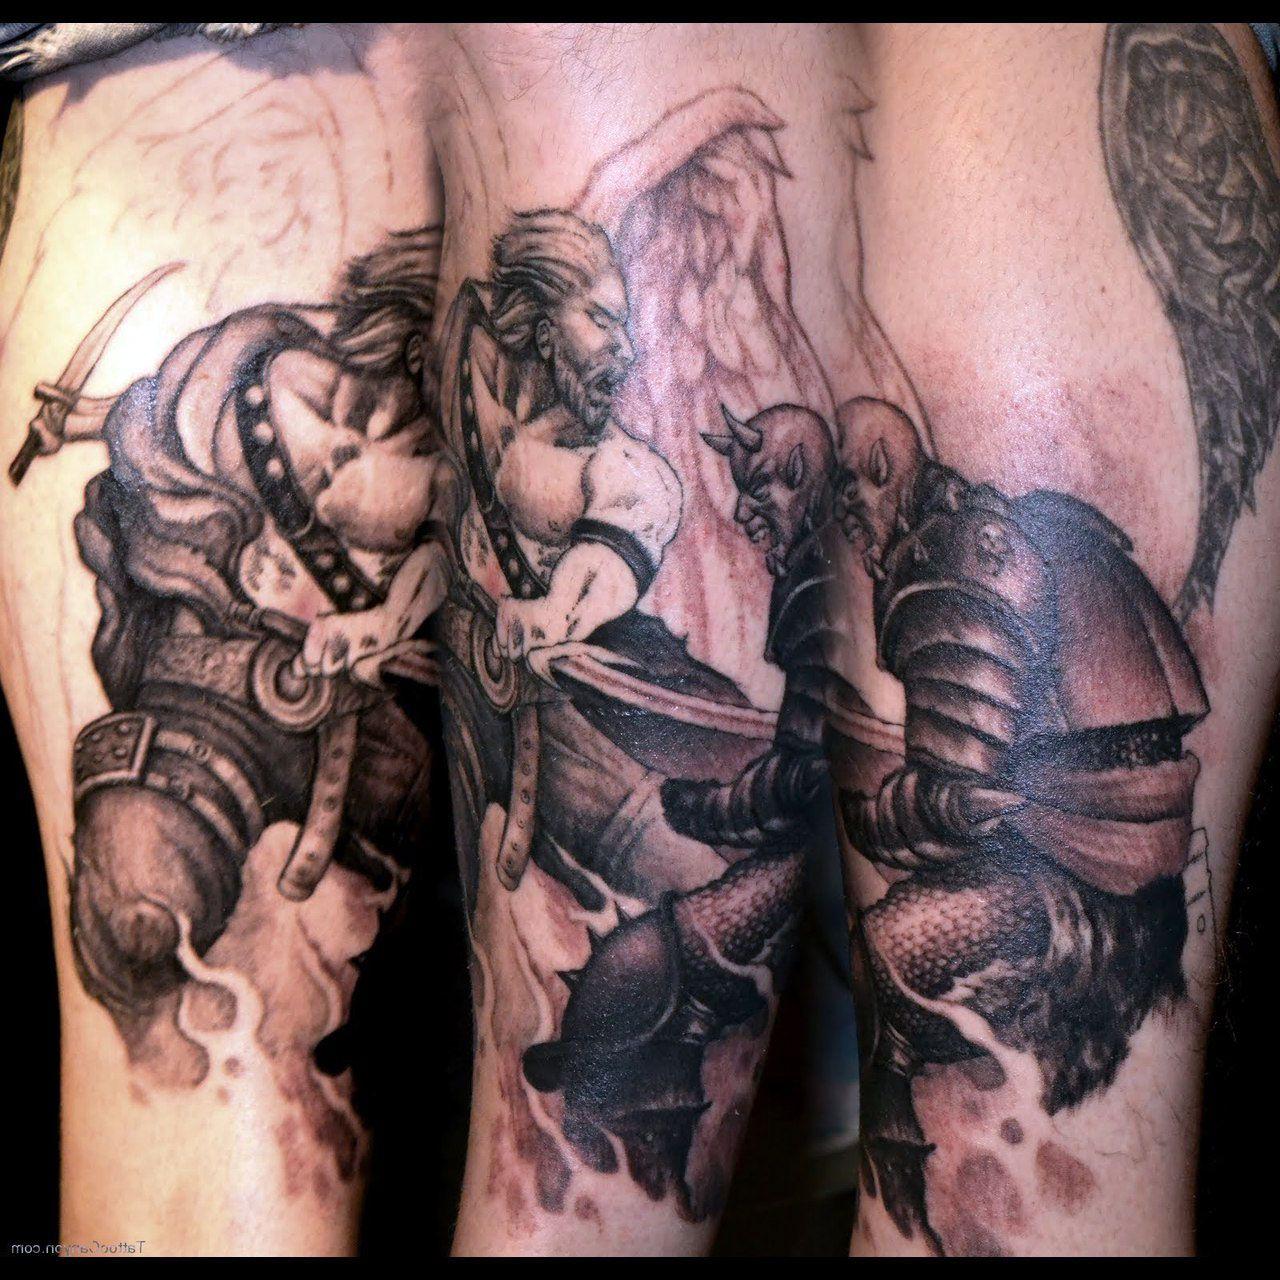 angel and demon fighting tattoo angel fighting demon tattoos cool rh pinterest com angel vs demon tattoo design angel vs demon tattoo design